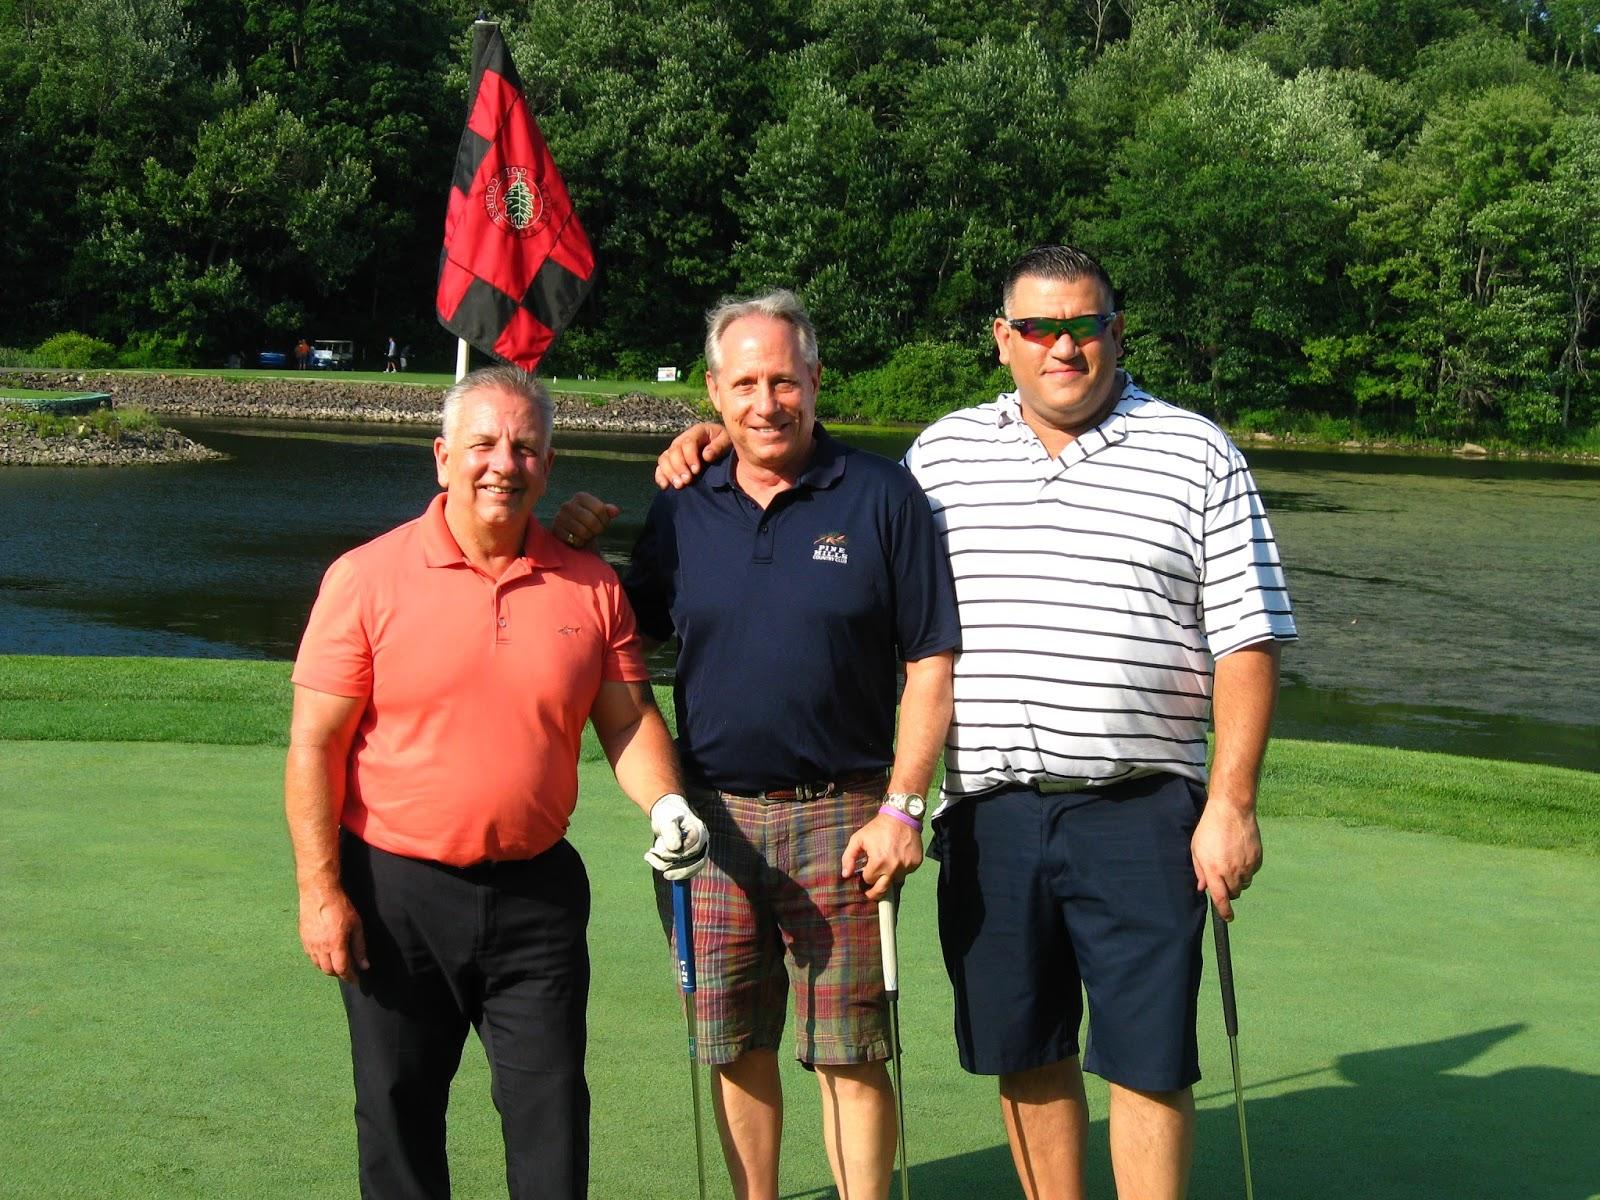 Colonial Ford Danbury Ct >> The Lebanon-American Club of Danbury: Golf Classic